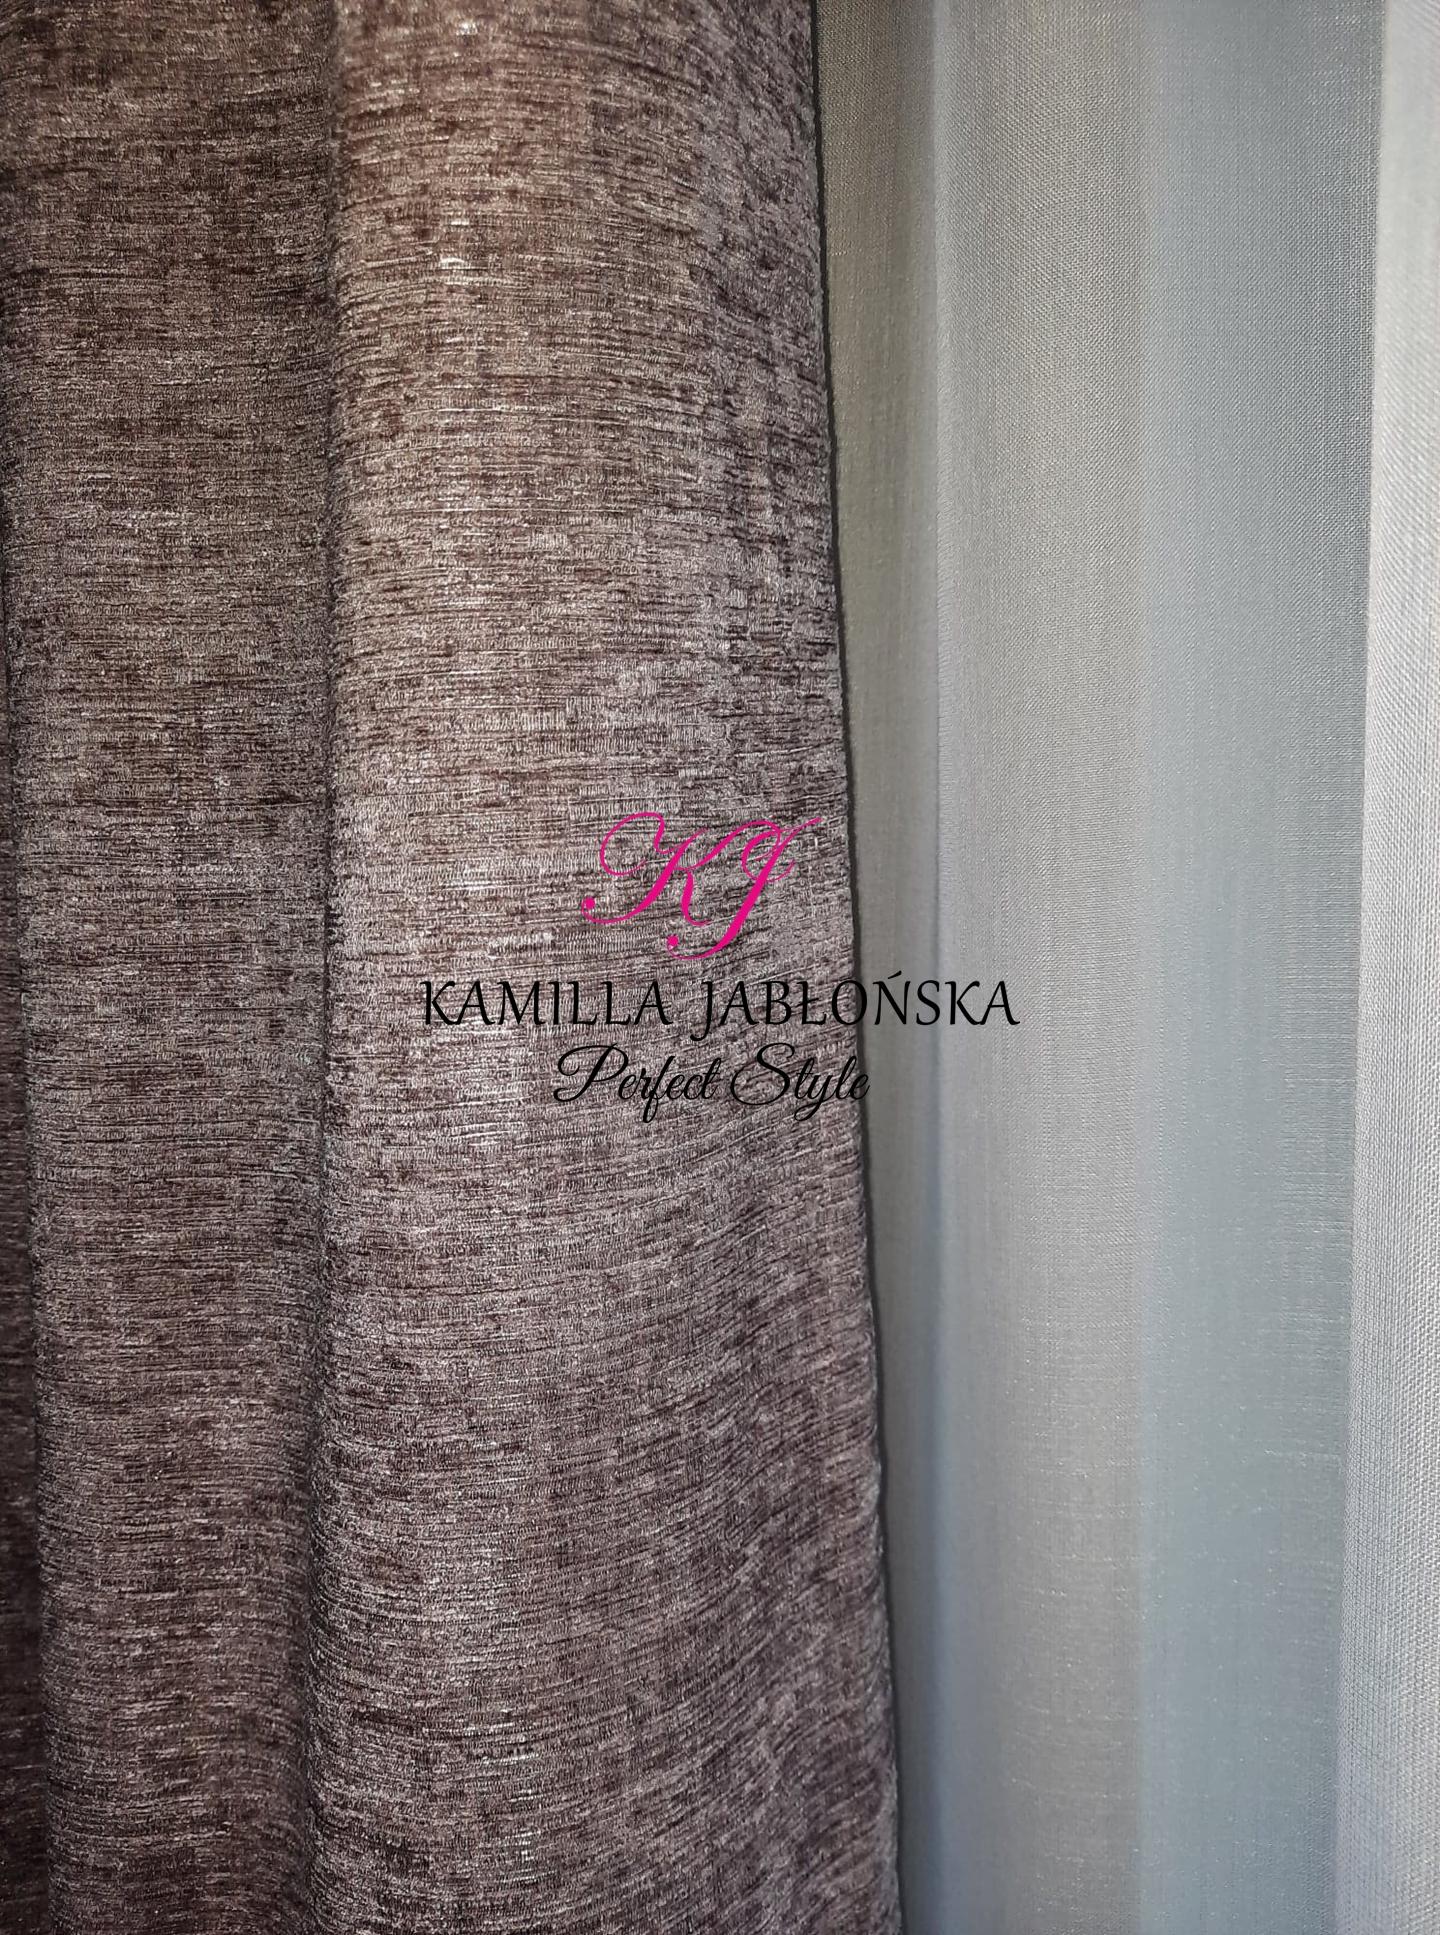 029Perfect Style Kamilla Jabłońska